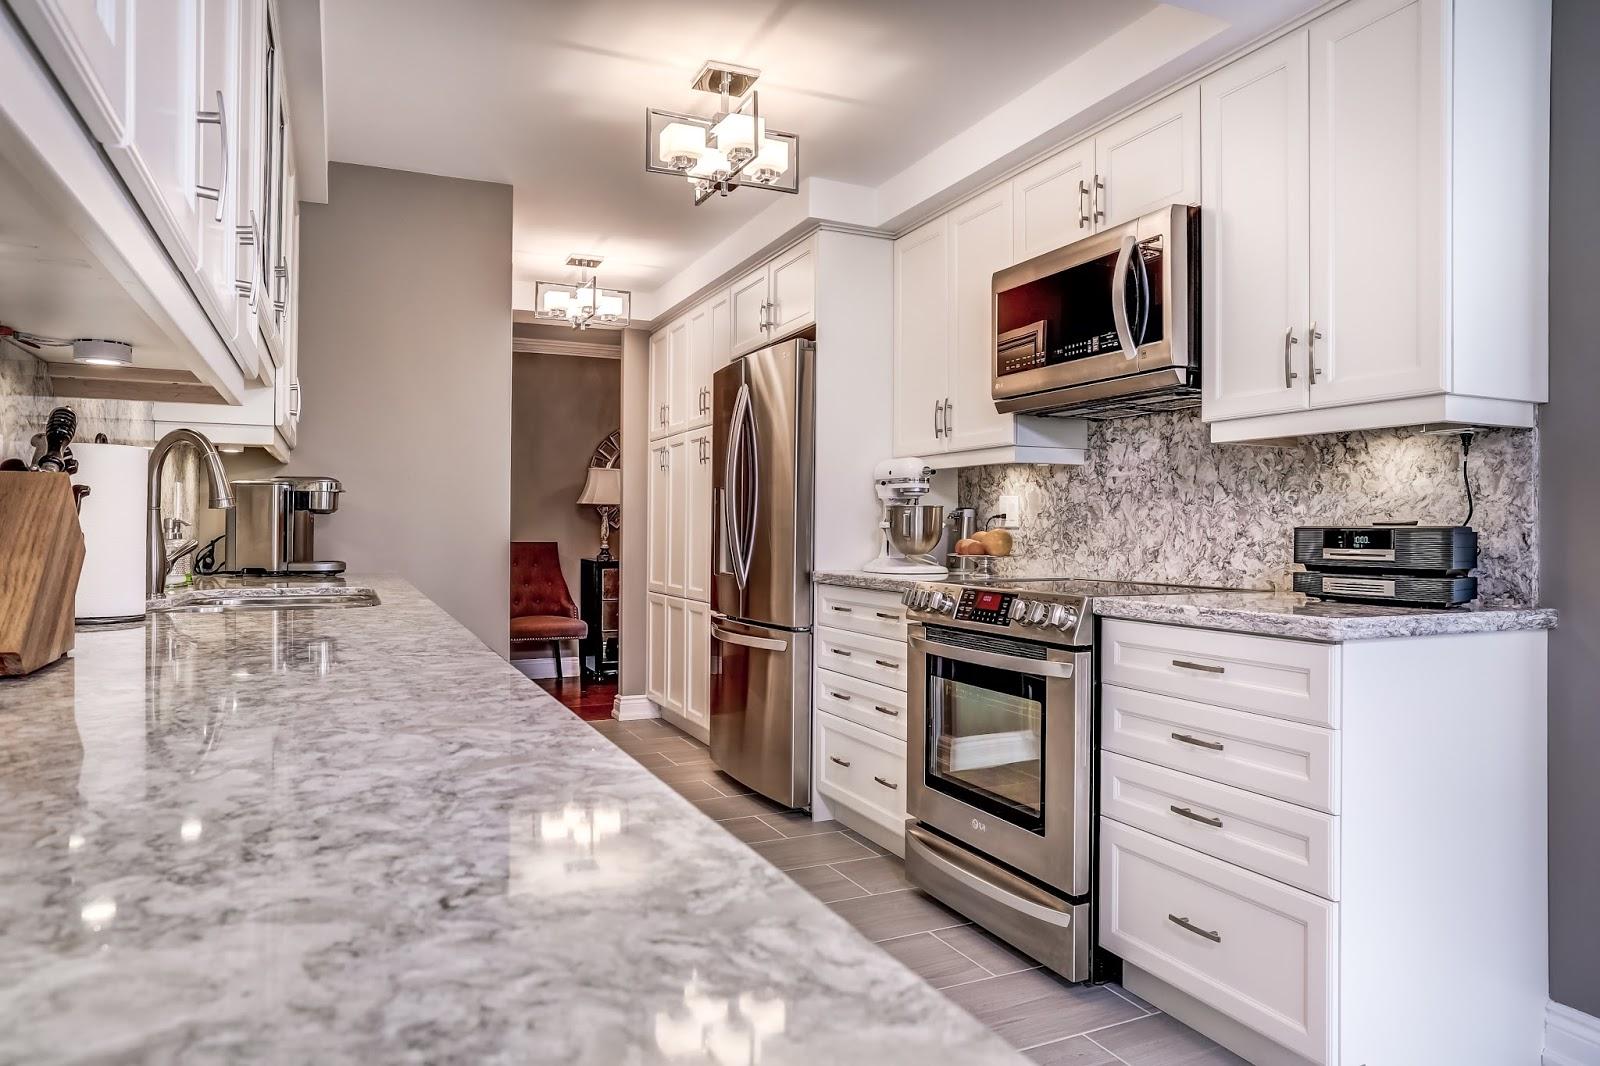 White Condo Kitchen Design By Monarch Kitchen U0026 Bath Centre. U201c